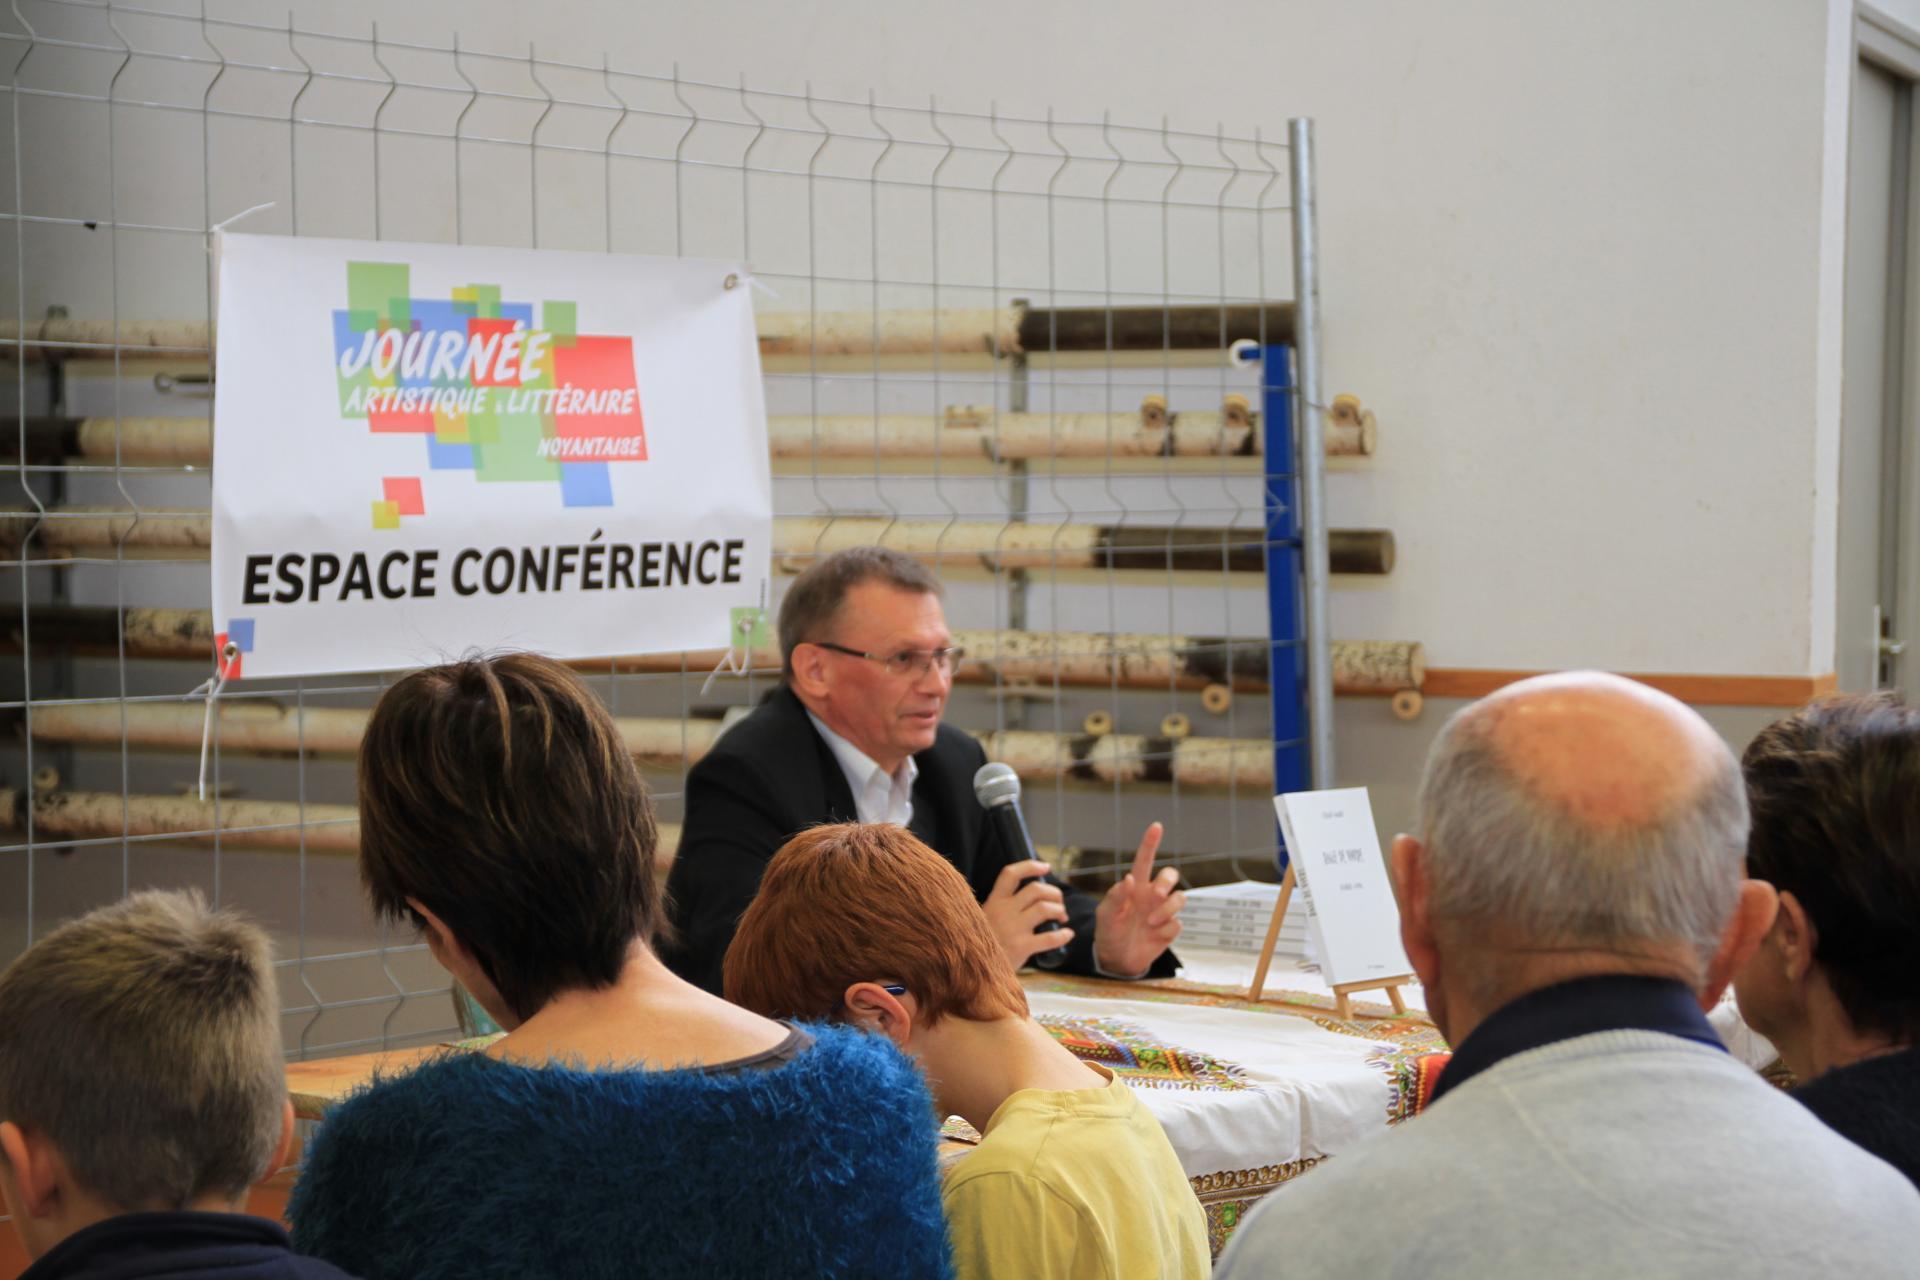 Espace Conférence